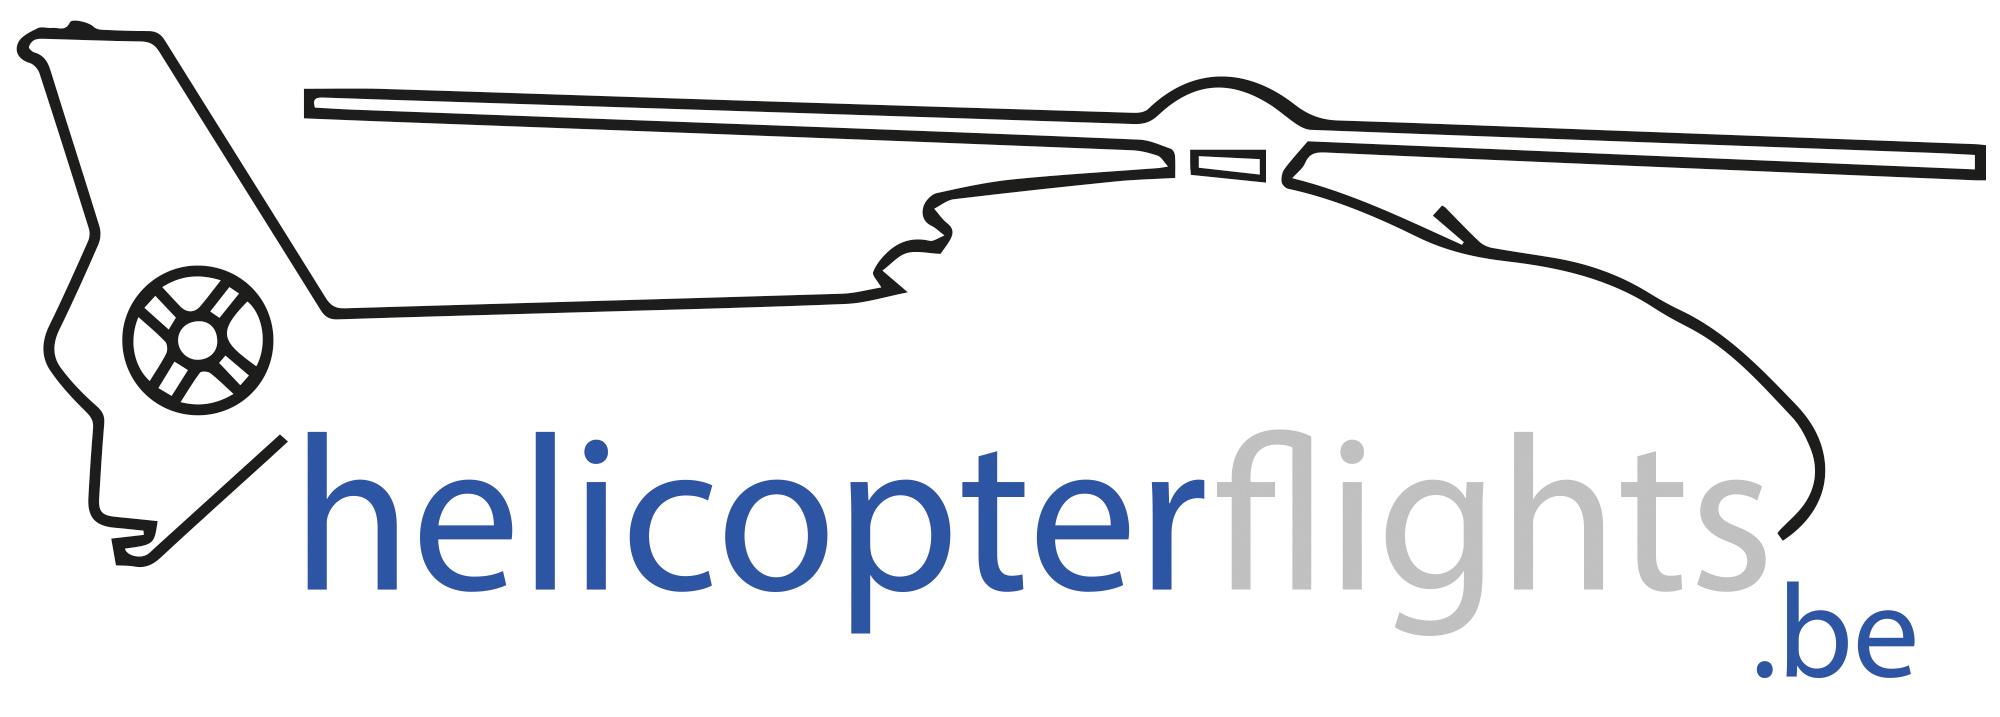 Heliventure FTO NV – helikopter opleiding piloot – VIP helikopter – helicopter bedrijf